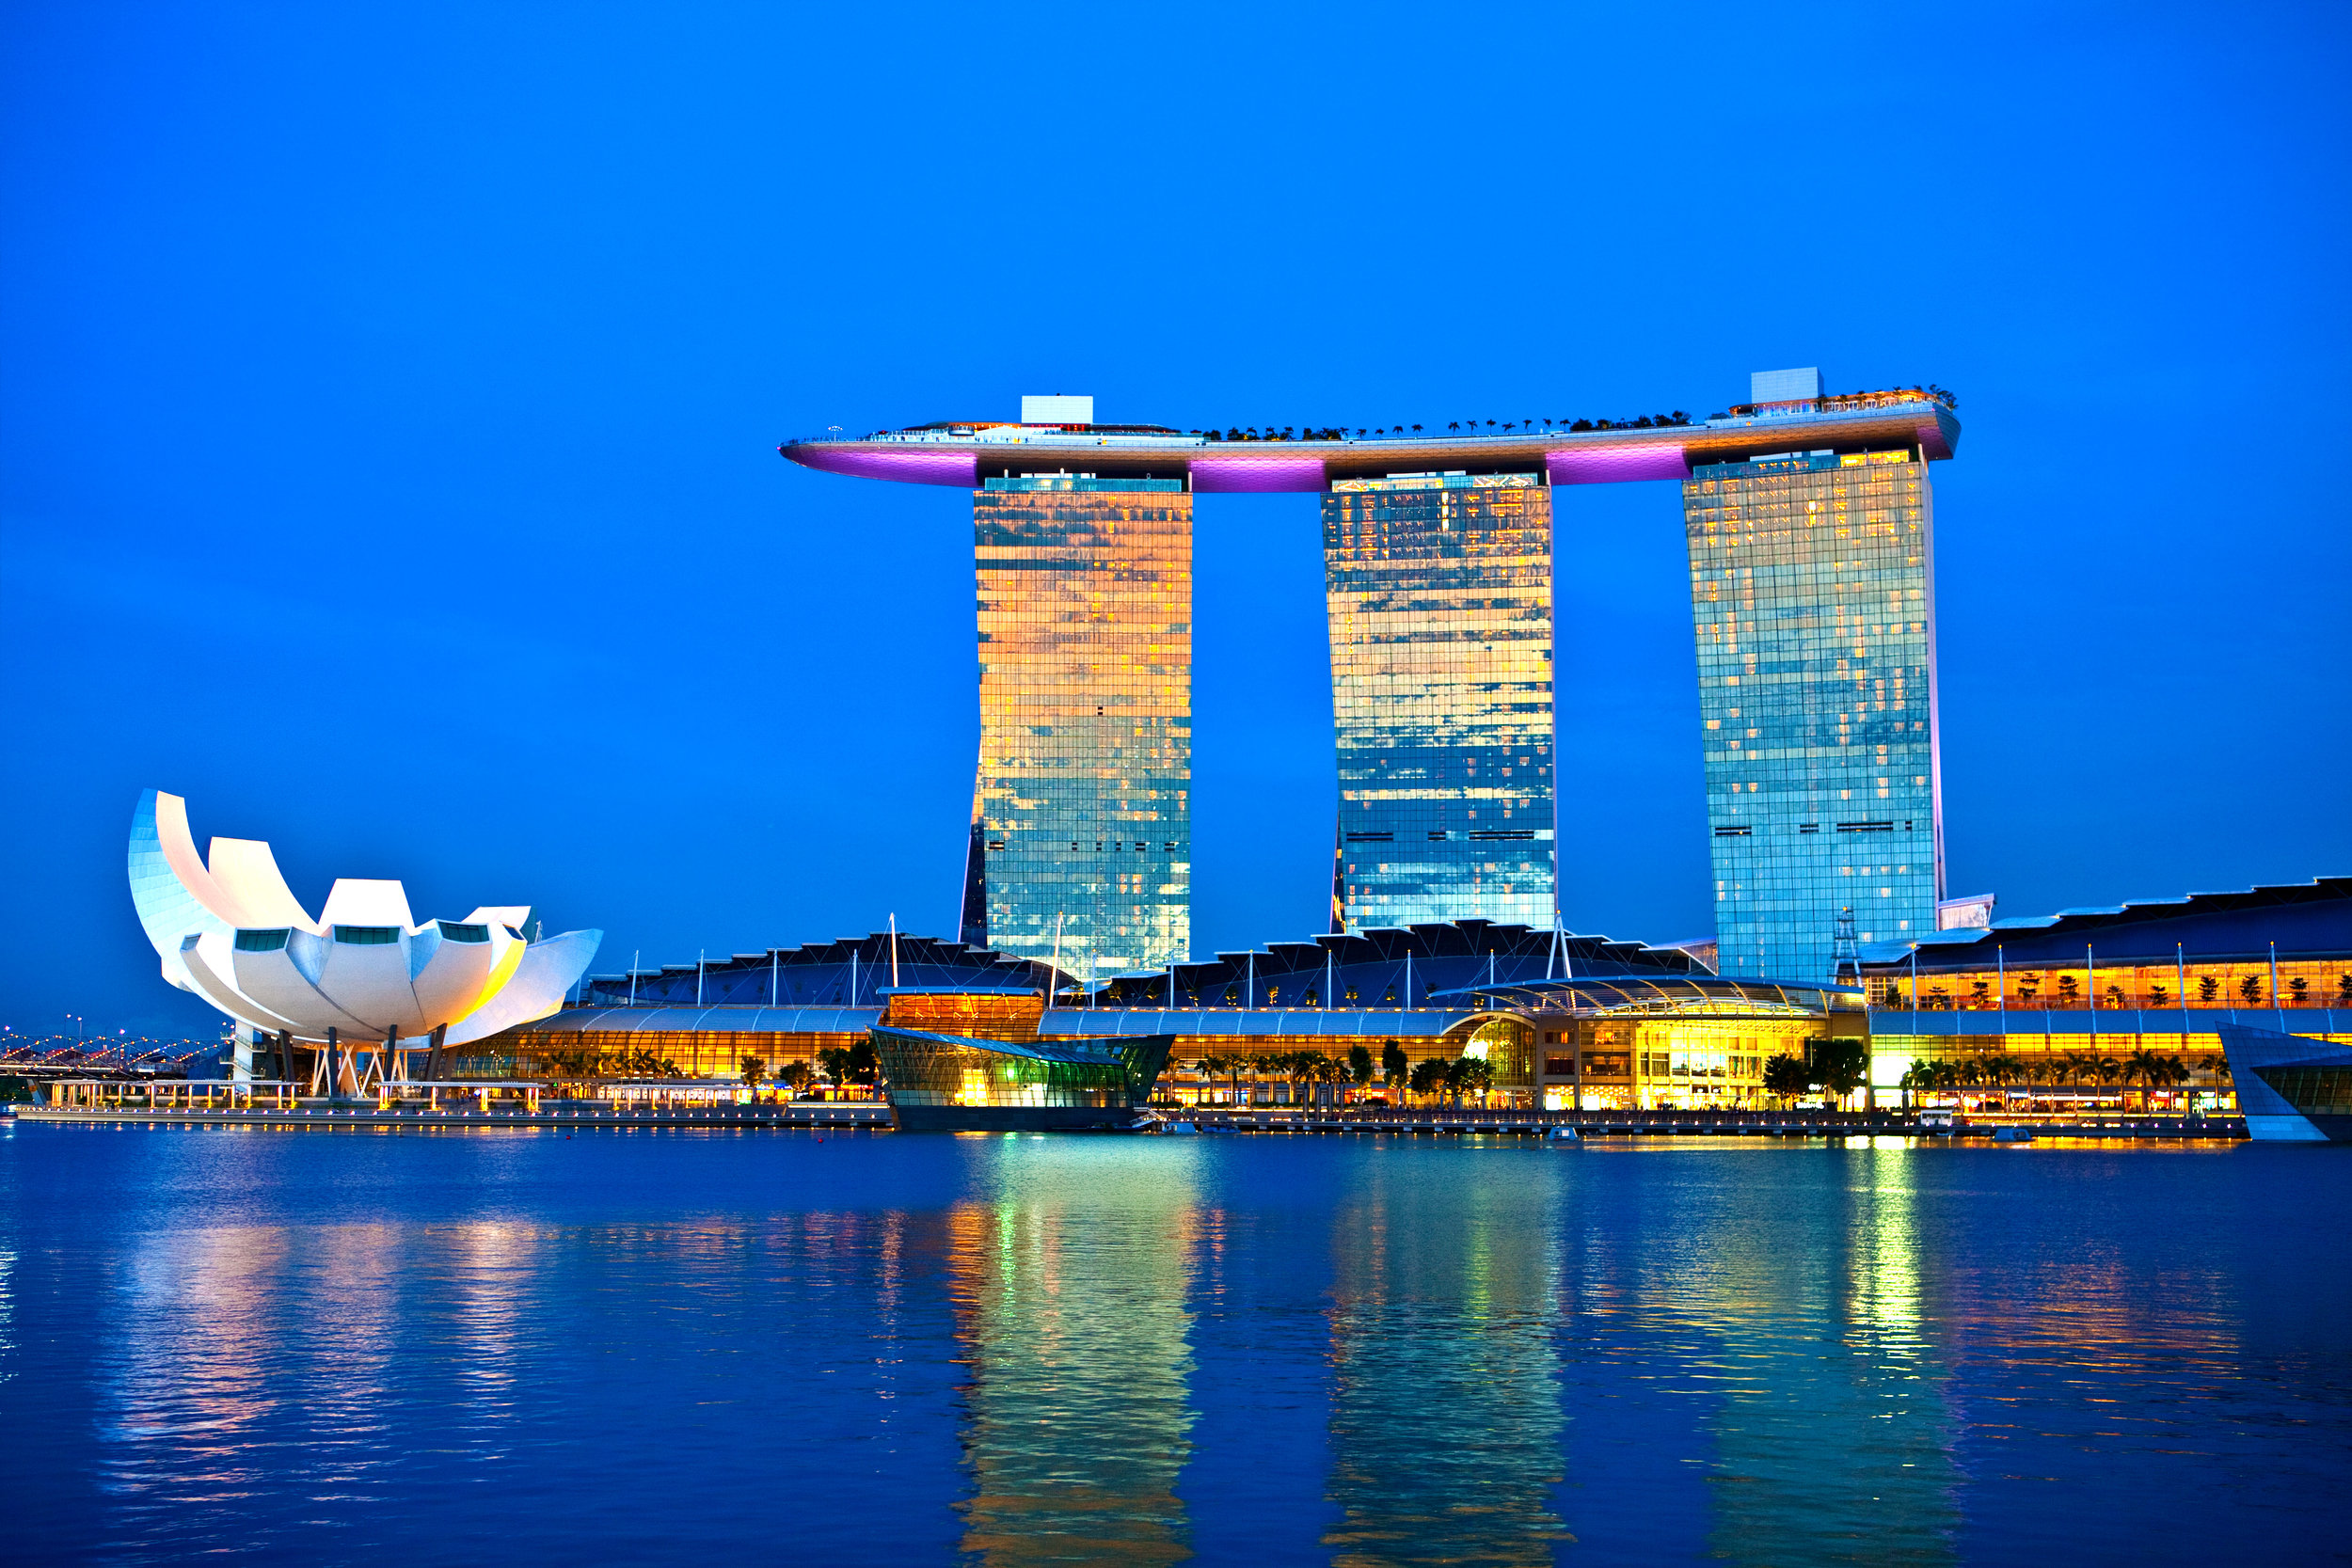 Marina Bay Sands SIngapore shutterstock_127224125.jpg